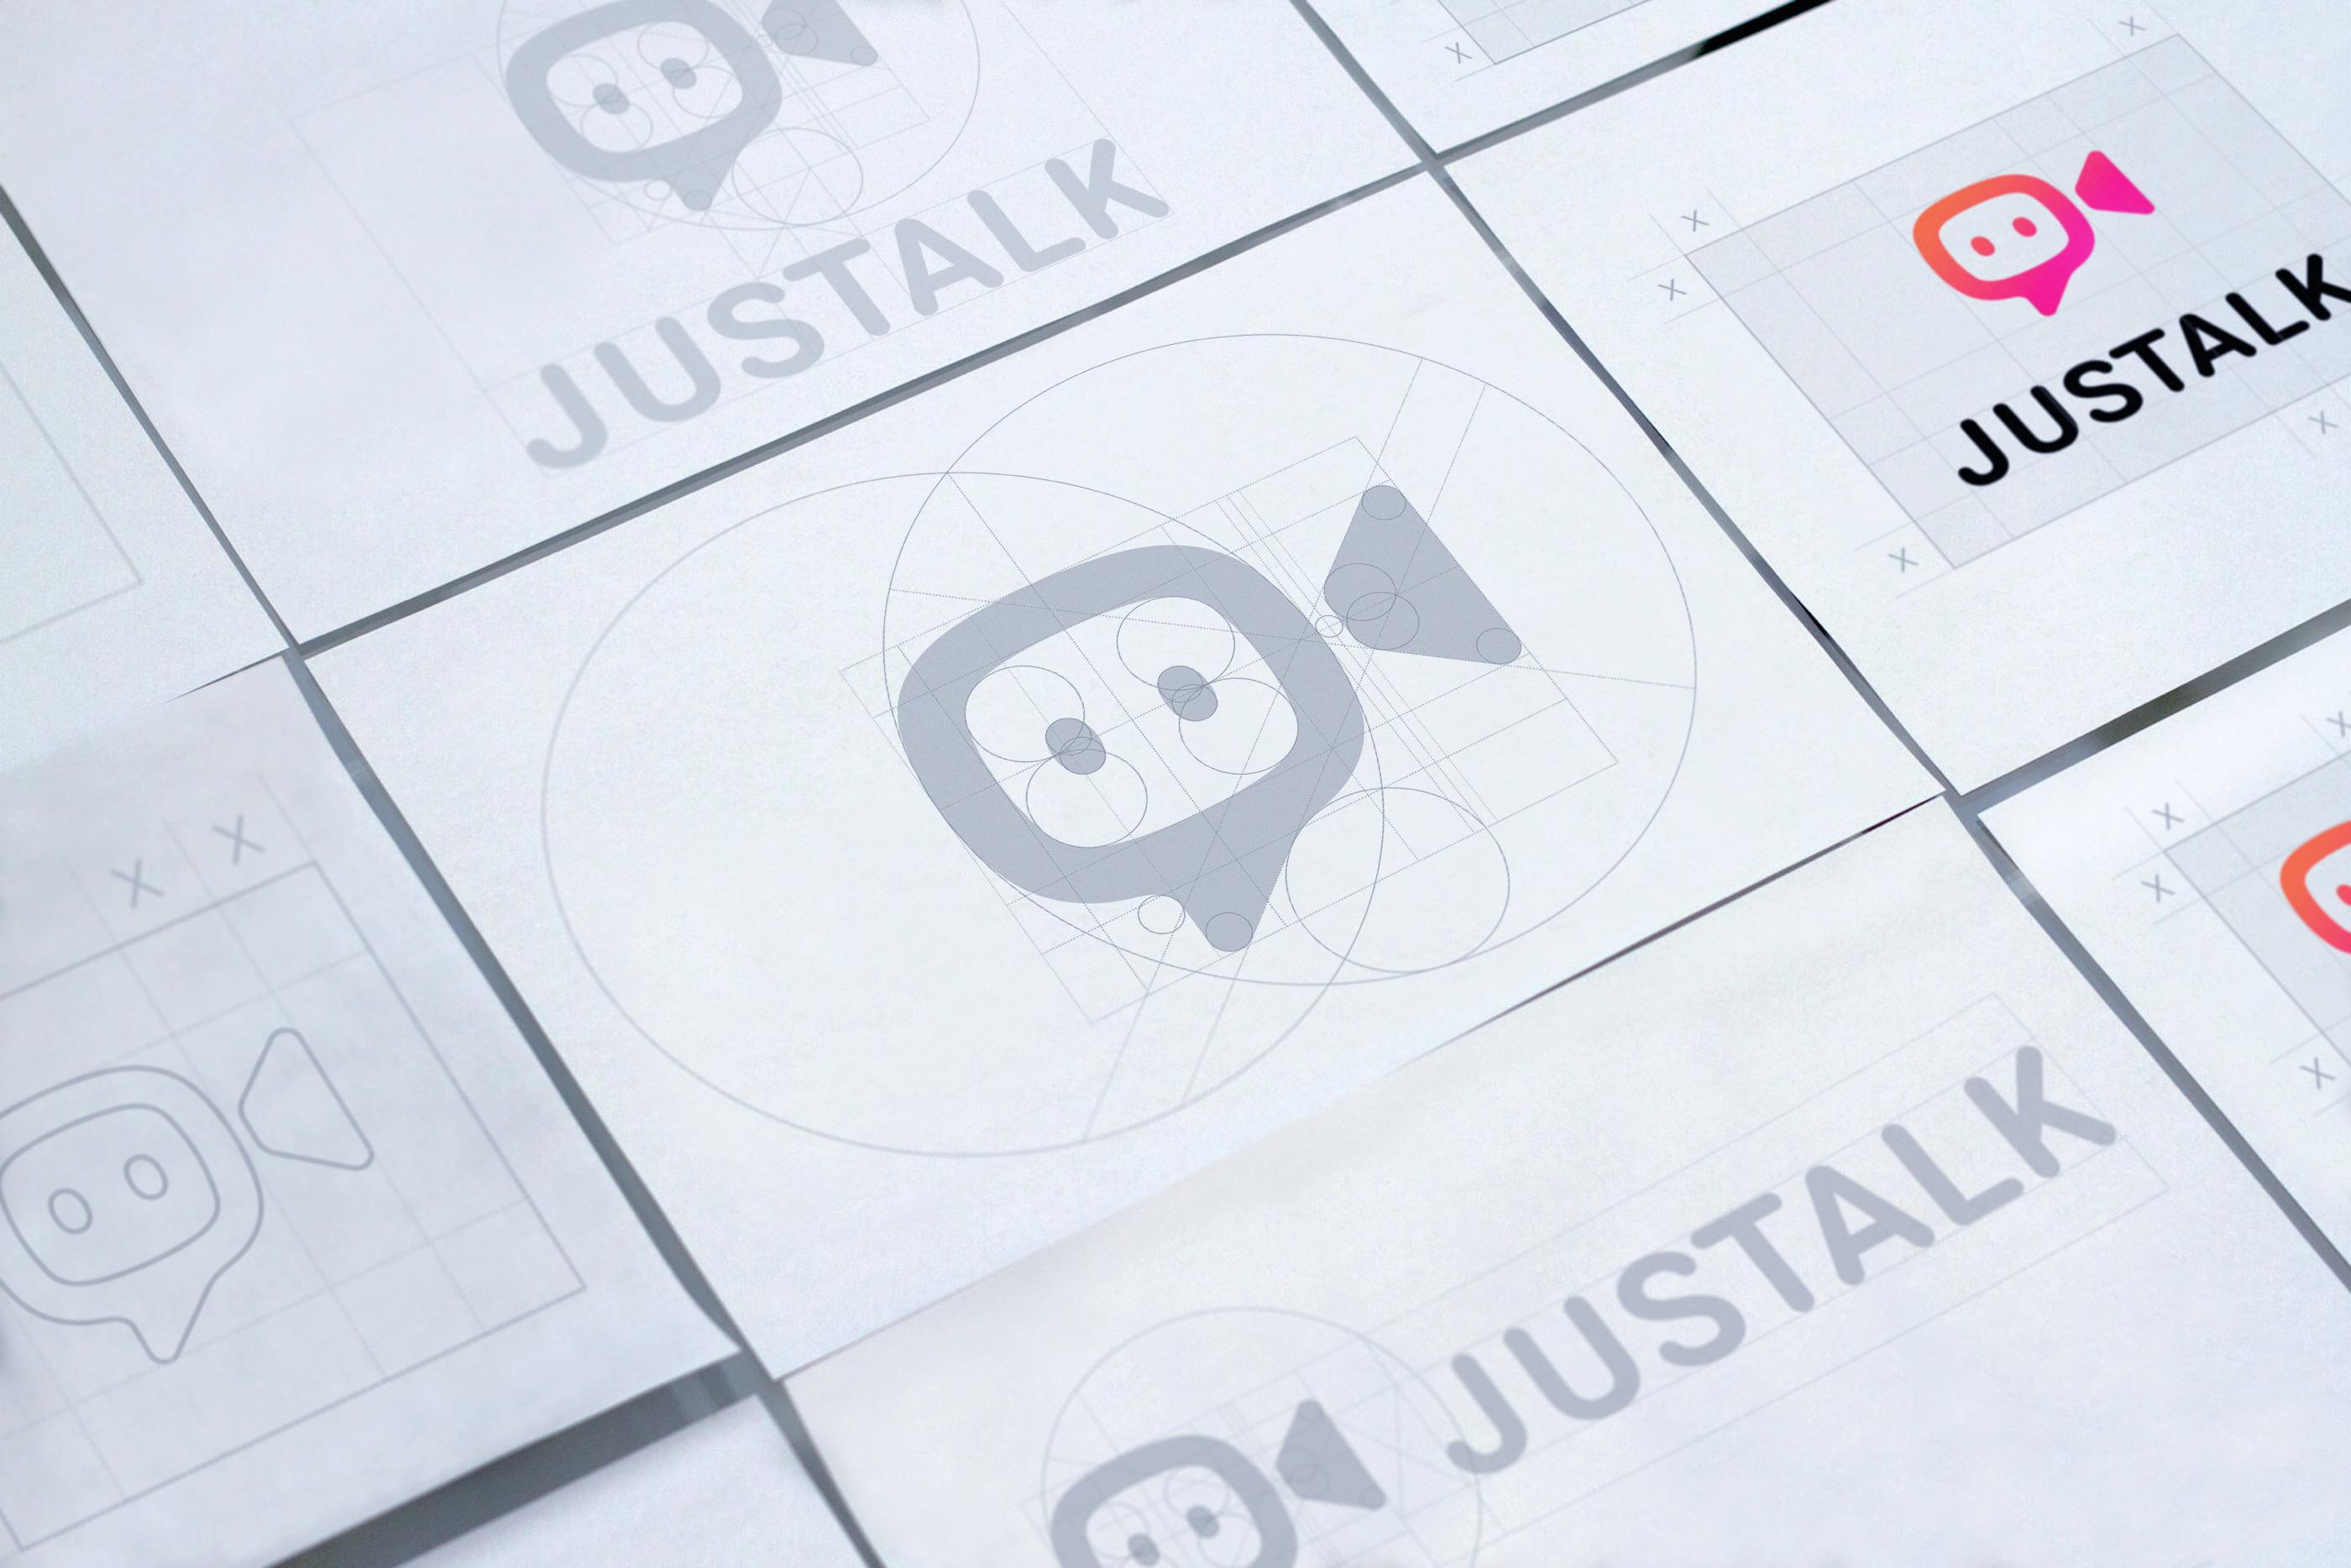 justalk logotype grid